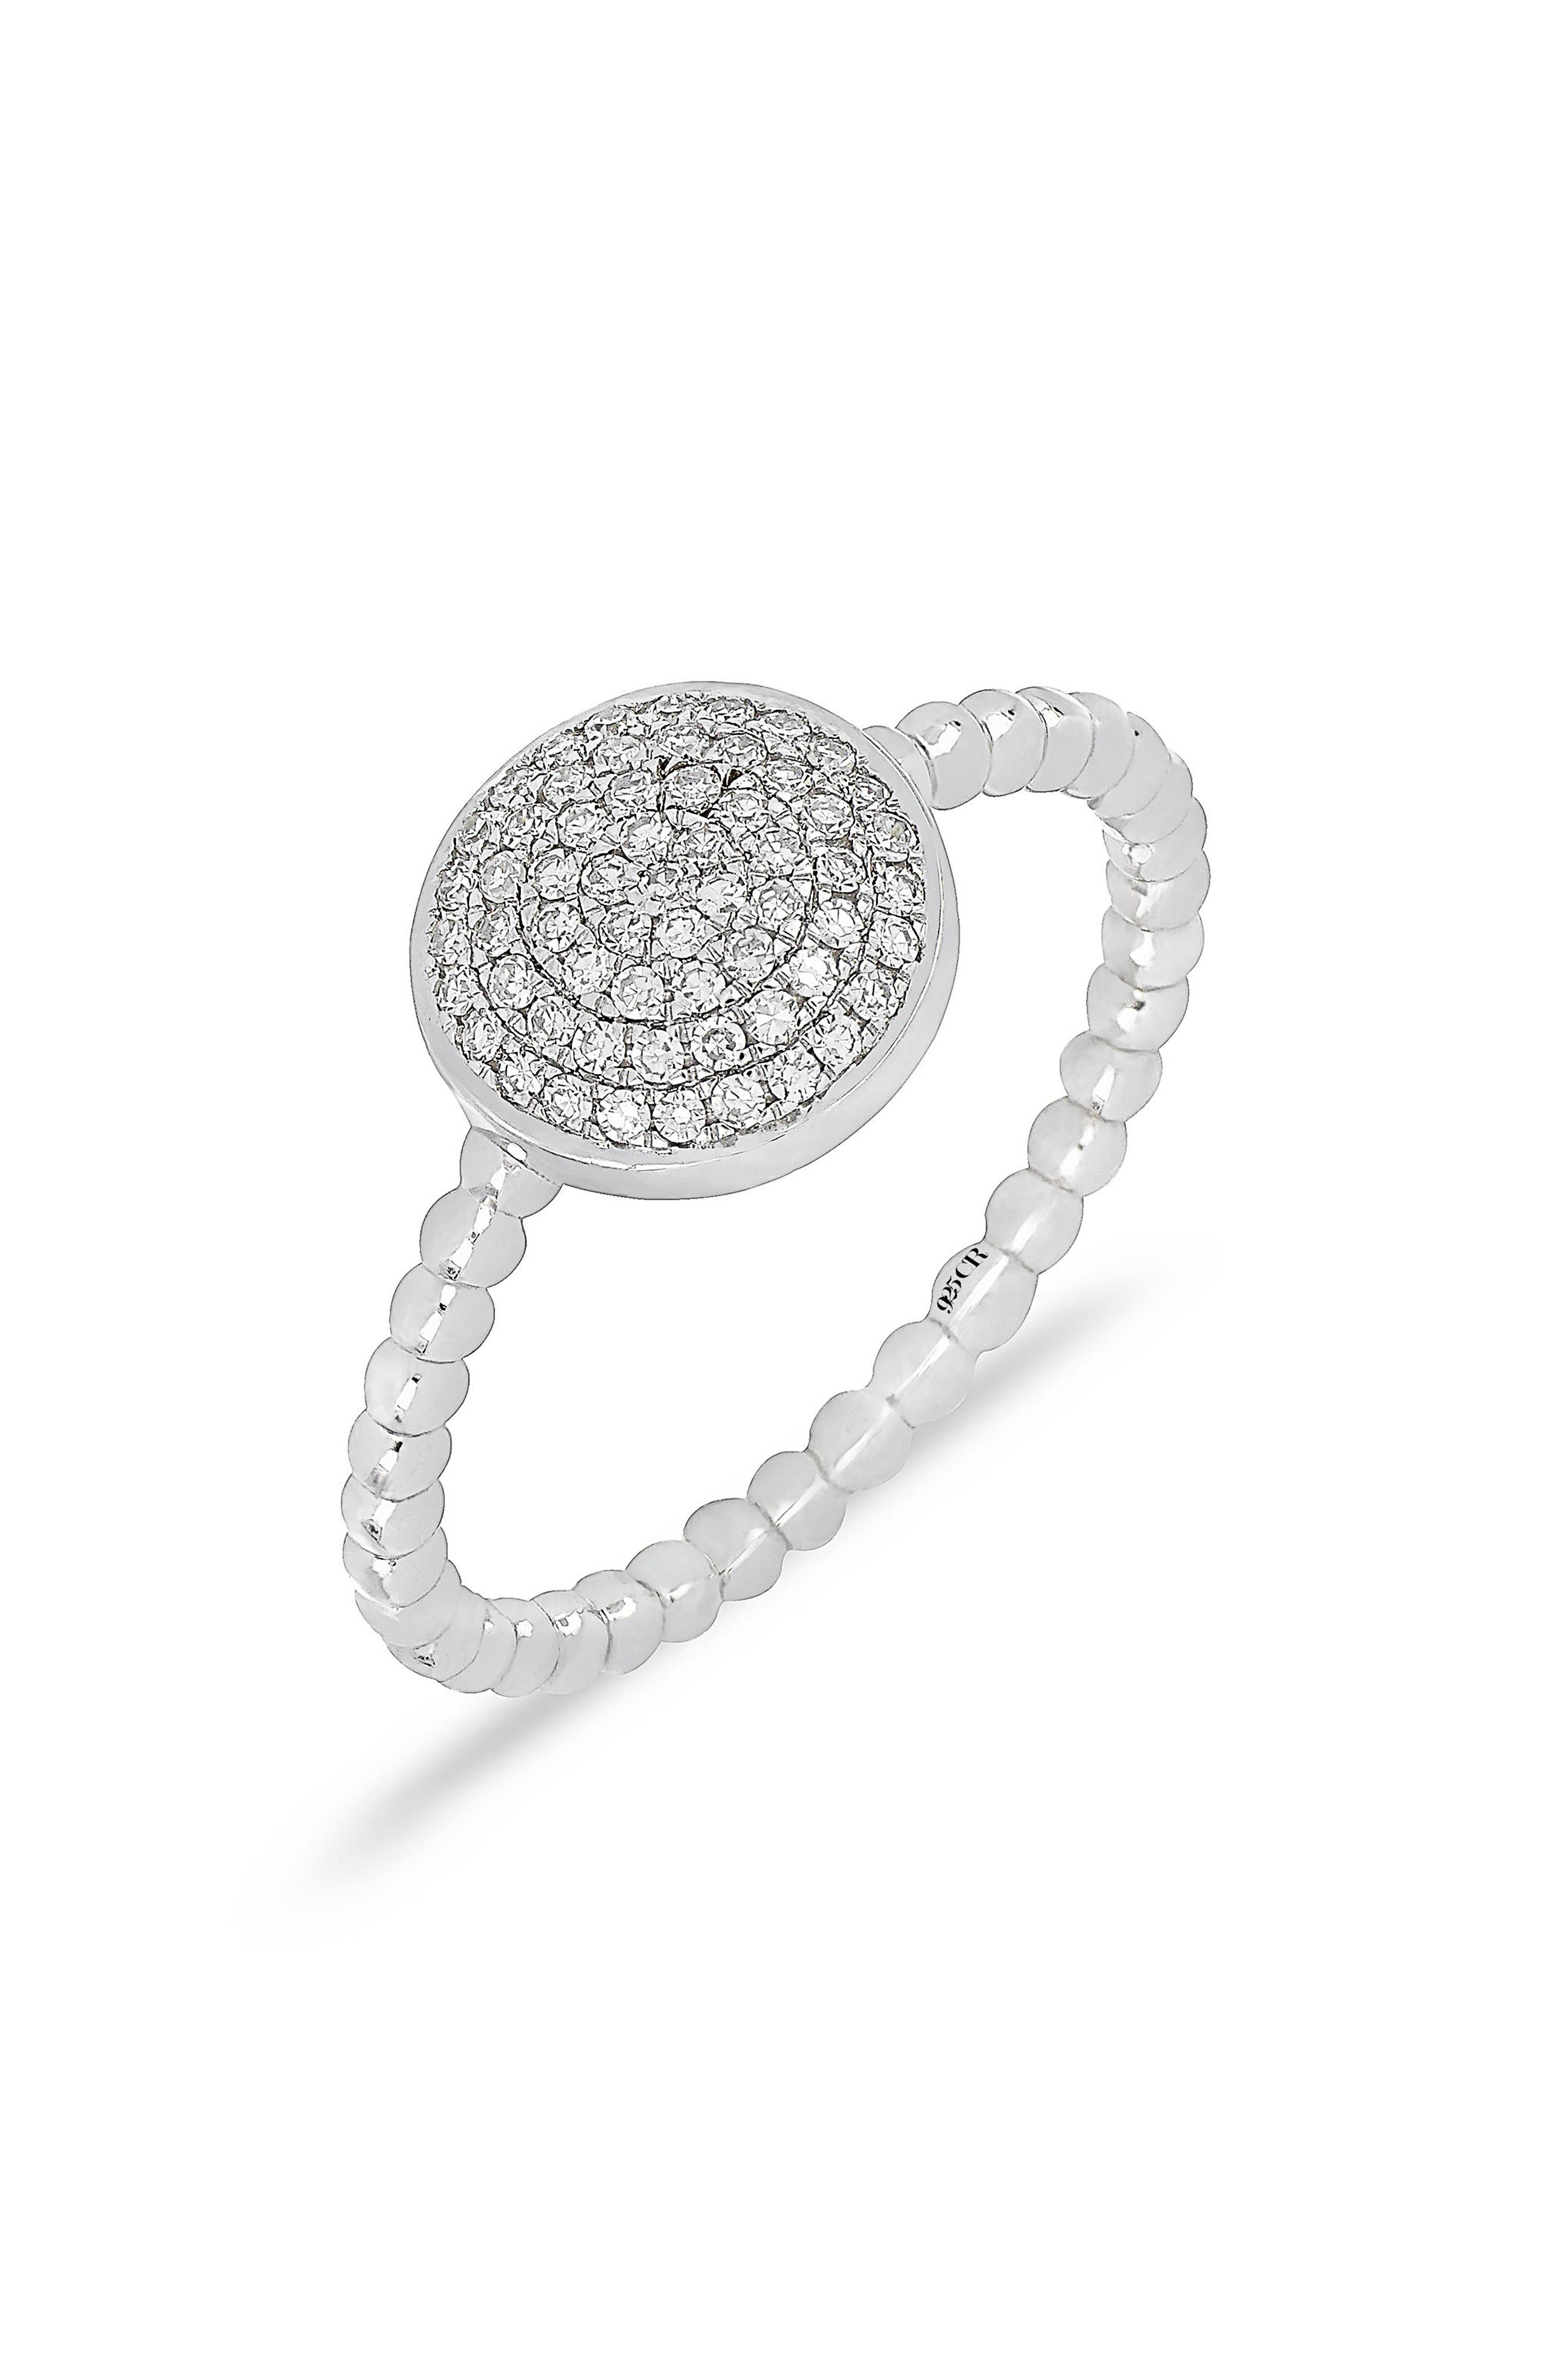 Carrière Pavé Diamond Disc Ring,                         Main,                         color, Silver/ Diamond